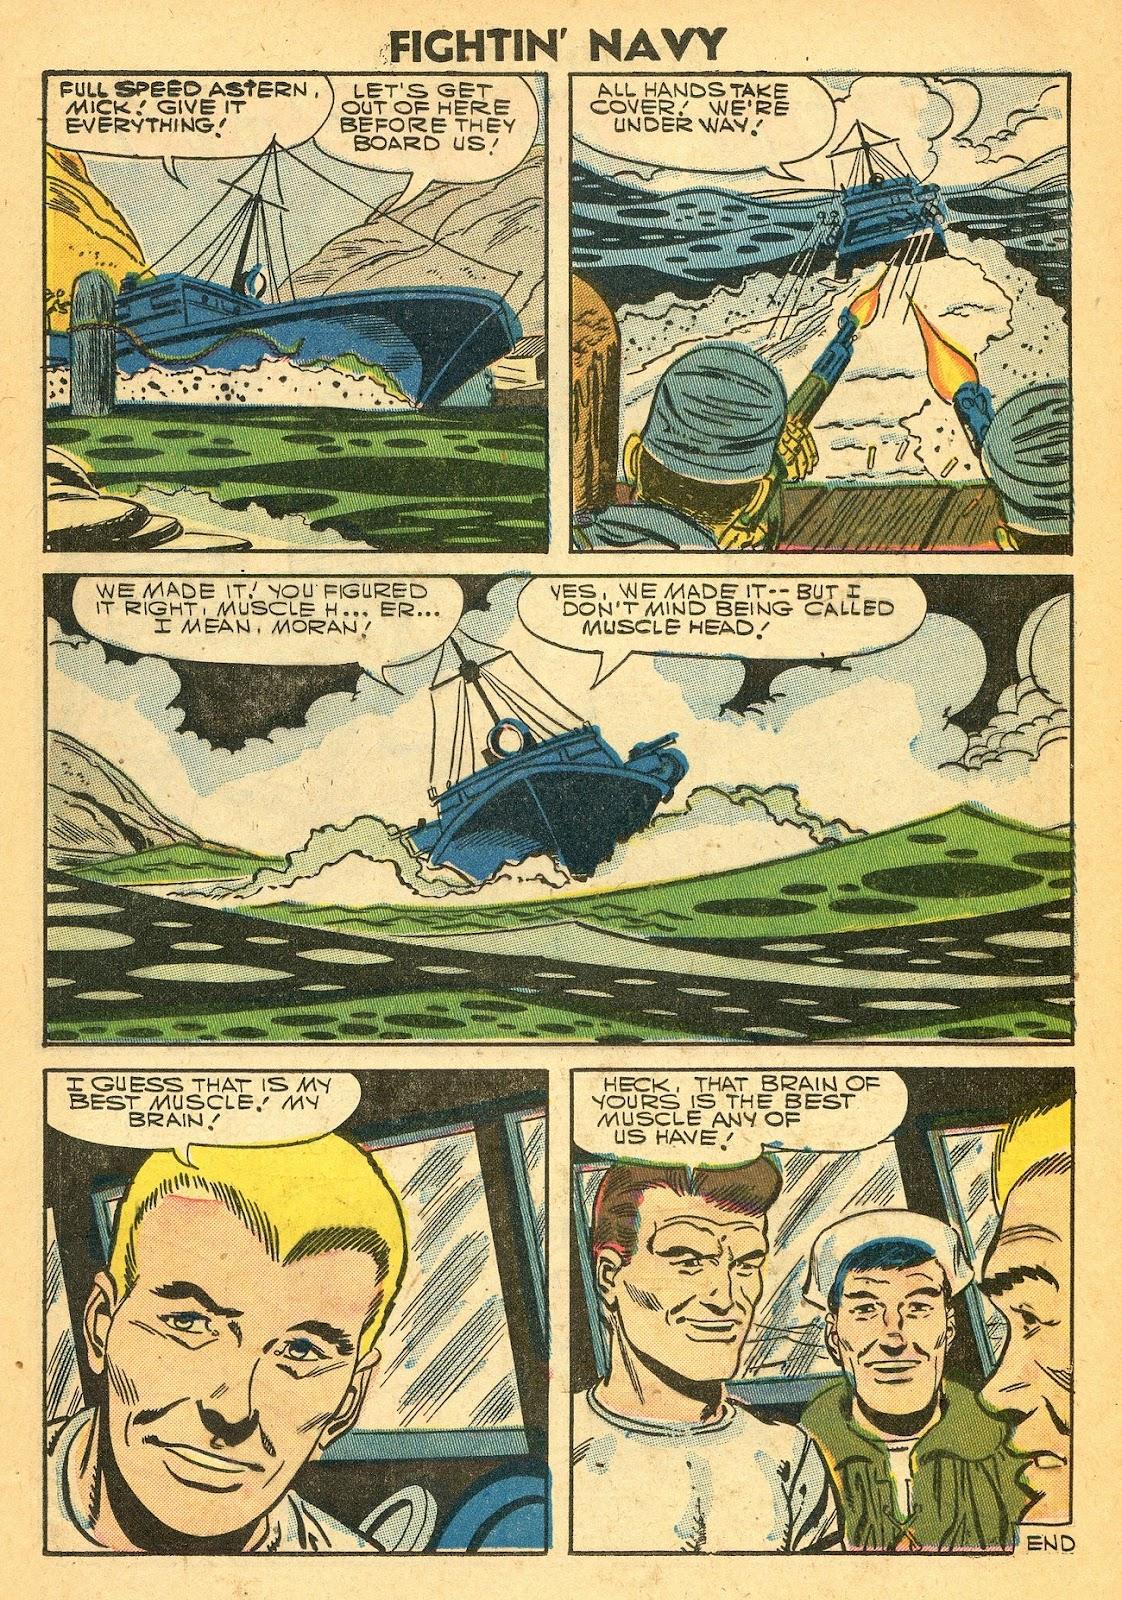 Read online Fightin' Navy comic -  Issue #77 - 25